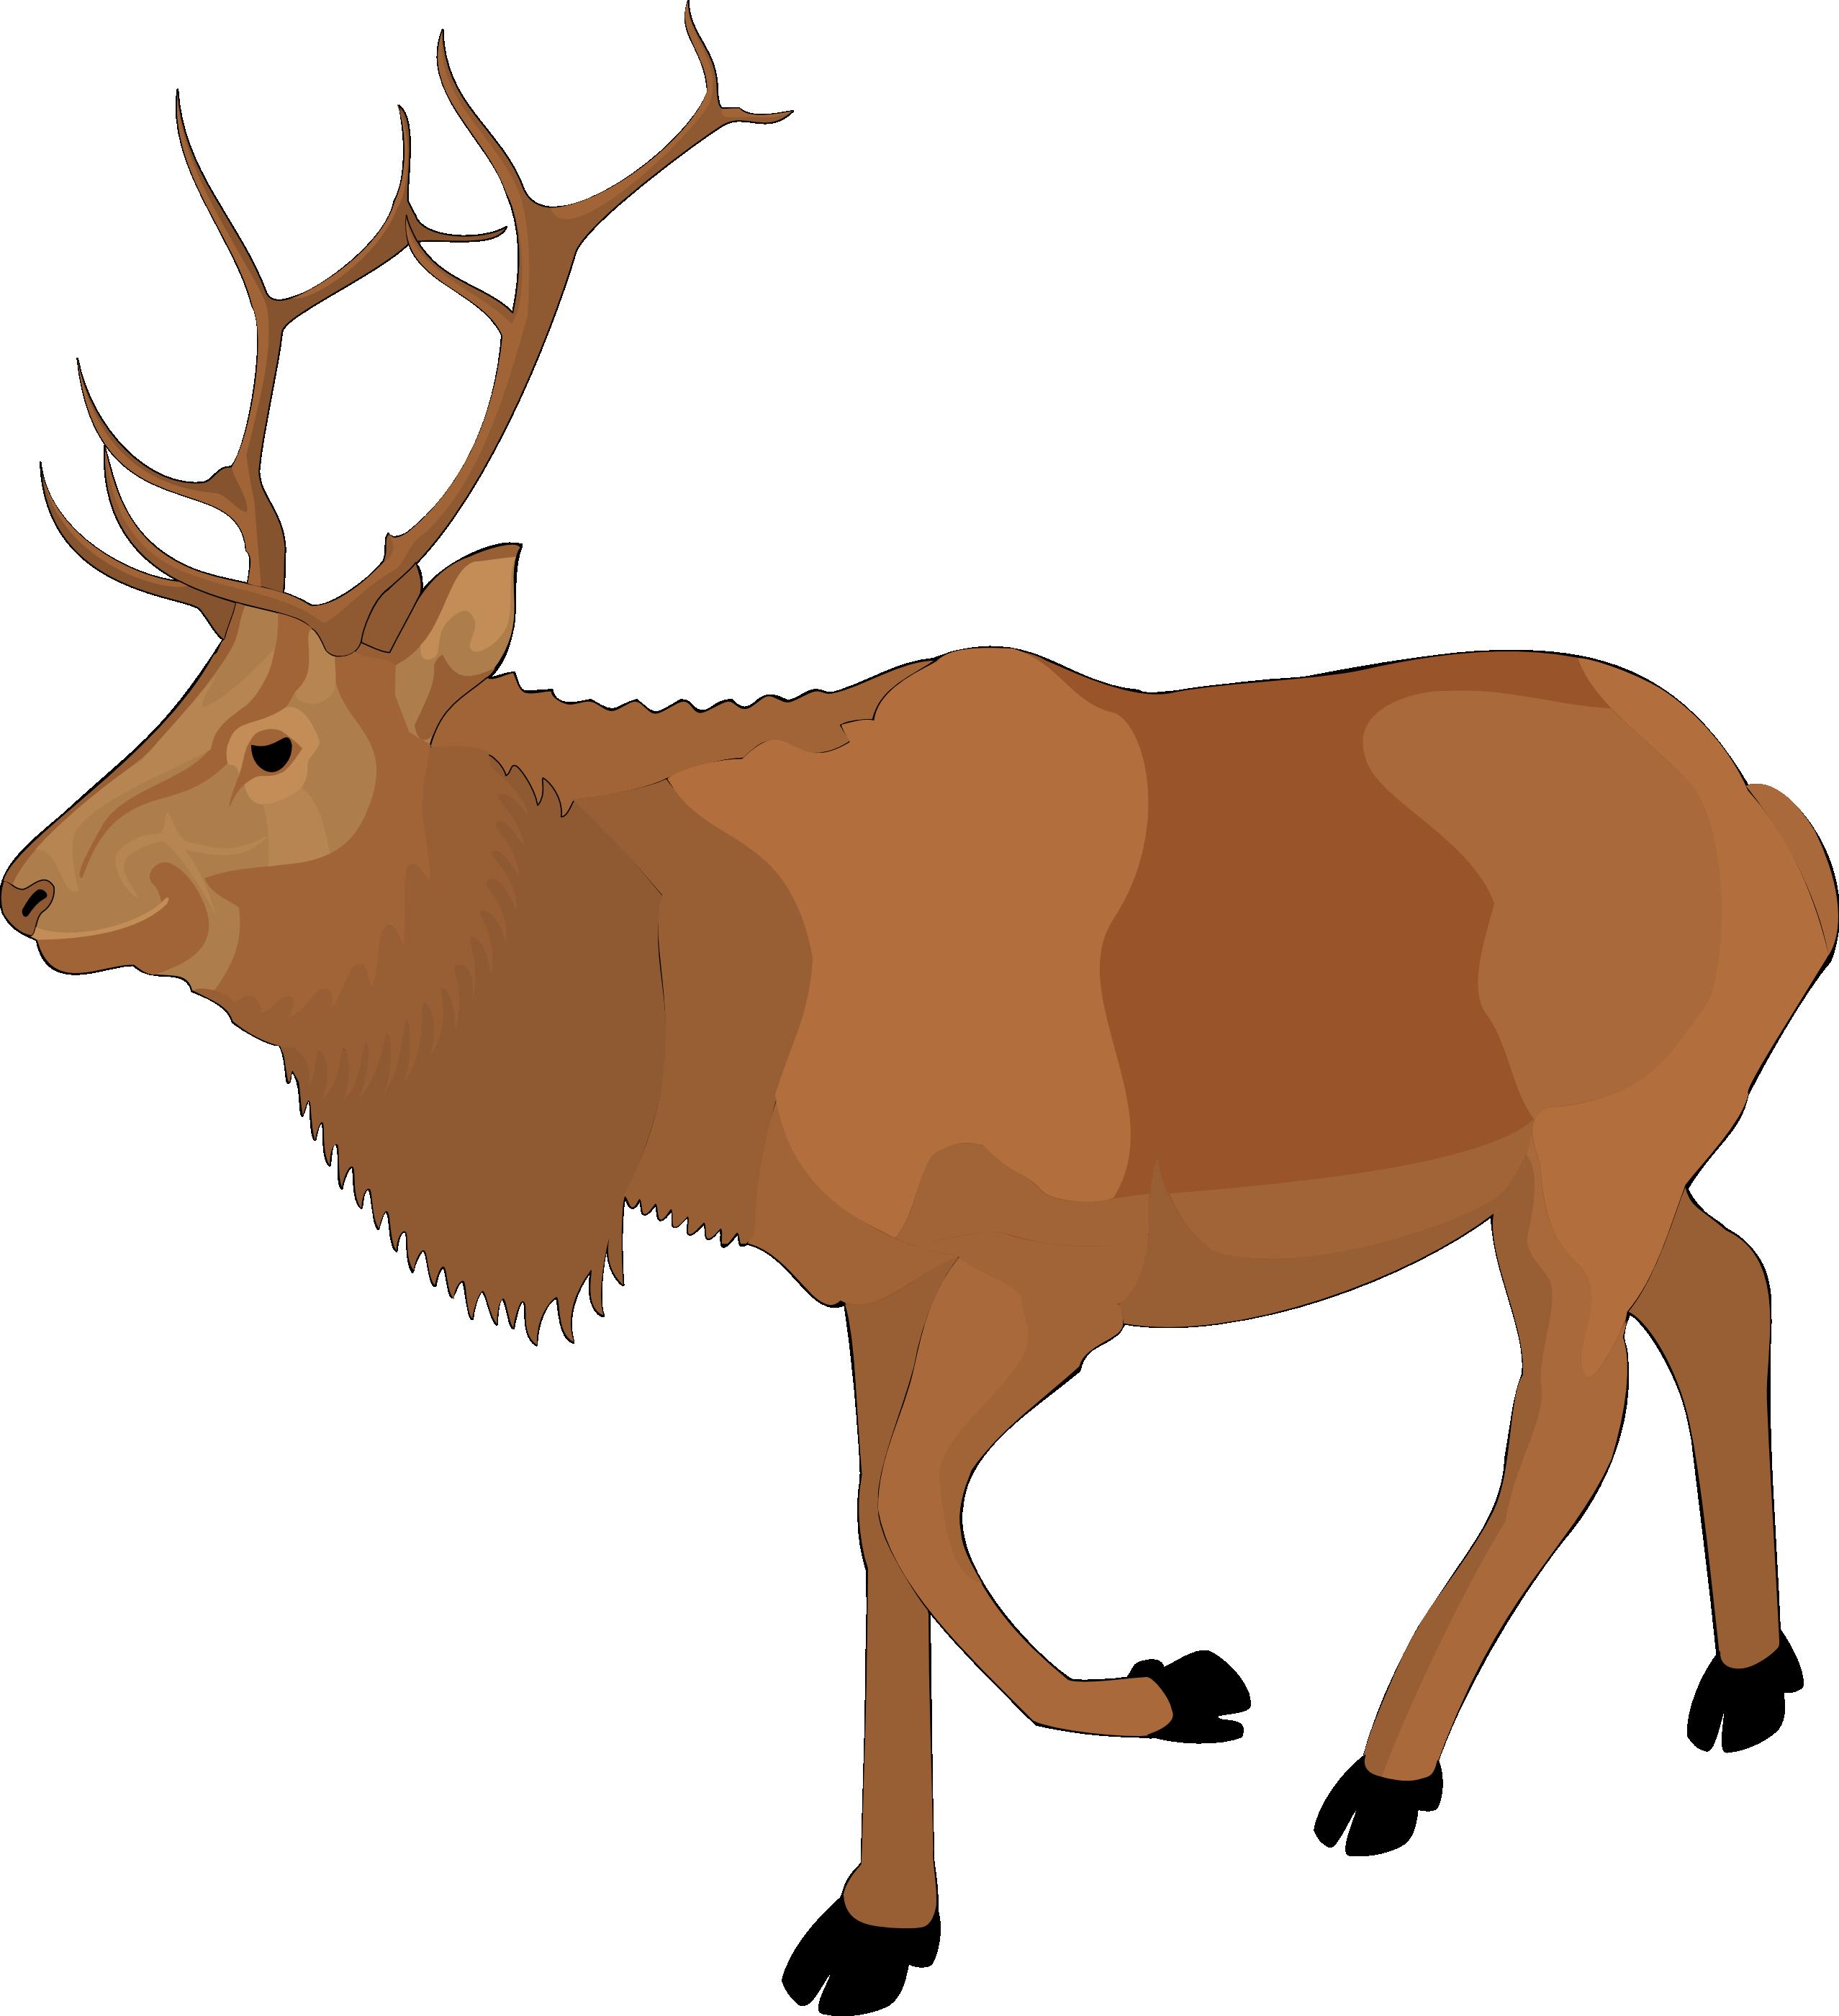 Animals elk clipart picture royalty free download Mammal,Vertebrate,Reindeer,Deer,Elk,Clip art,Wildlife,Antler ... picture royalty free download